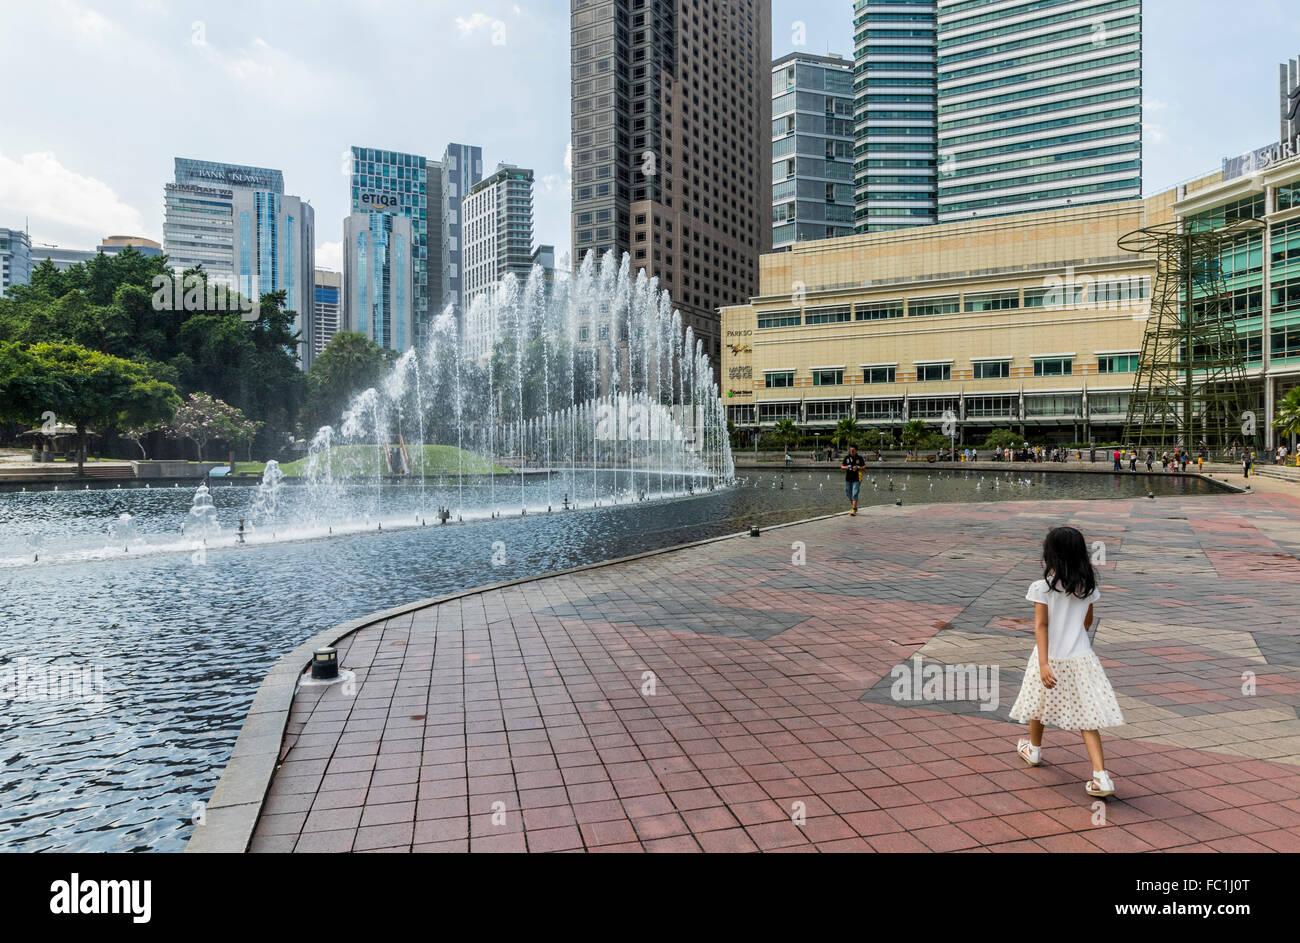 Child enjoying fountains at lake Symphony KL city centre park Kuala Lumpur Malaysia - Stock Image